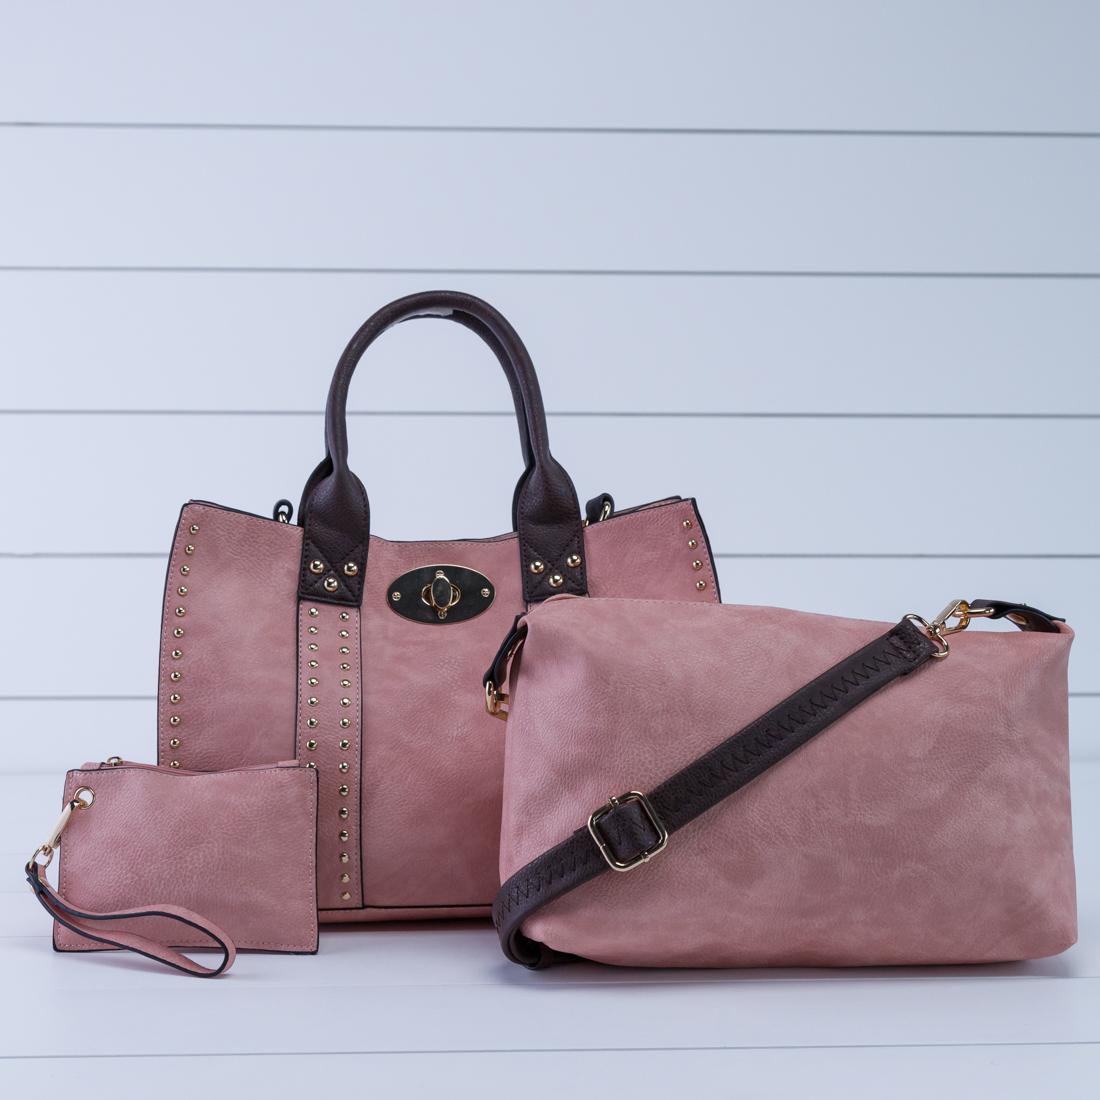 Light Coral 3-in-1 Bag